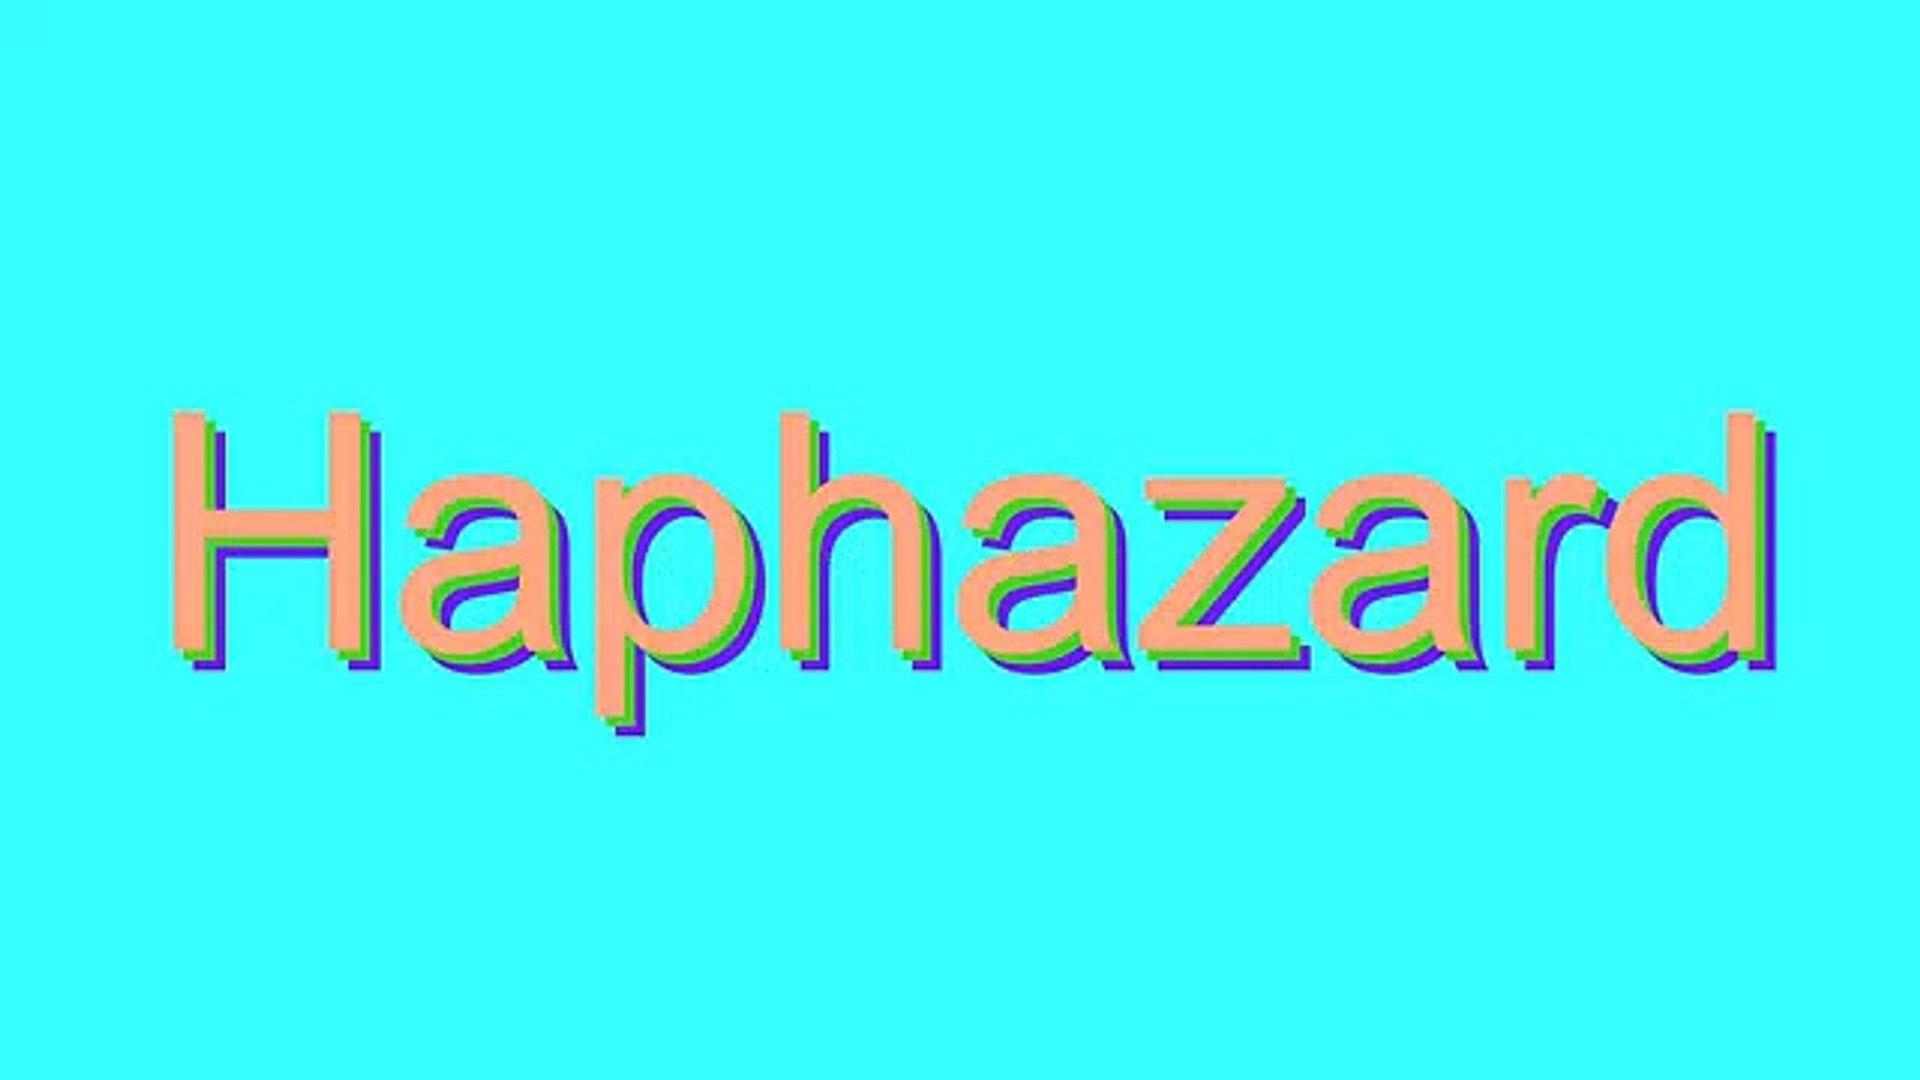 How to Pronounce Haphazard